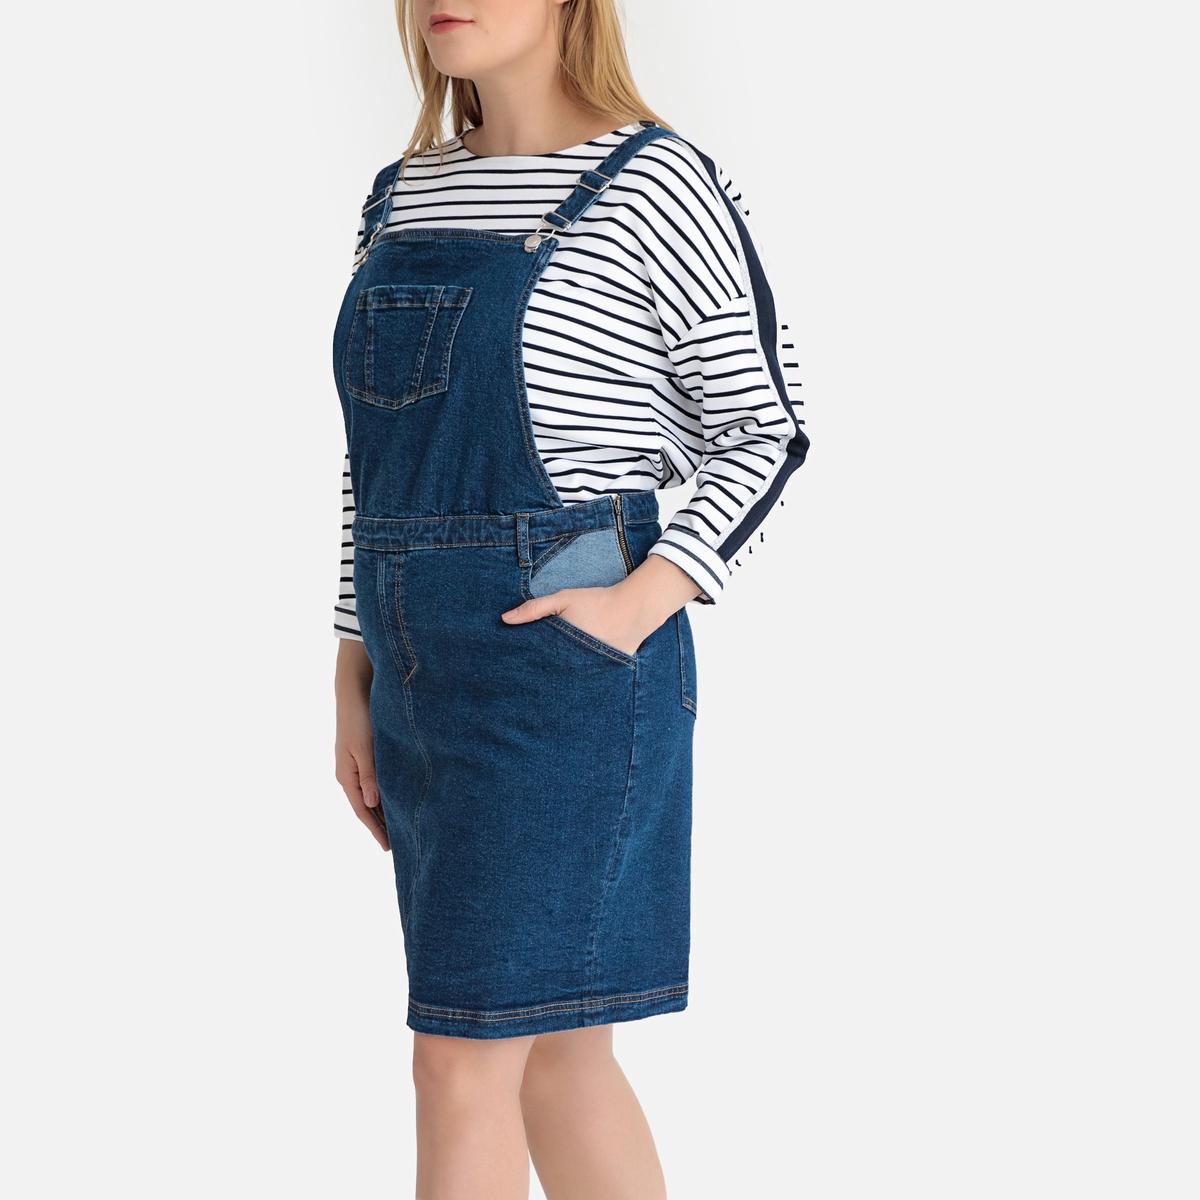 Платье-комбинезон La Redoute Из денима 52 (FR) - 58 (RUS) синий